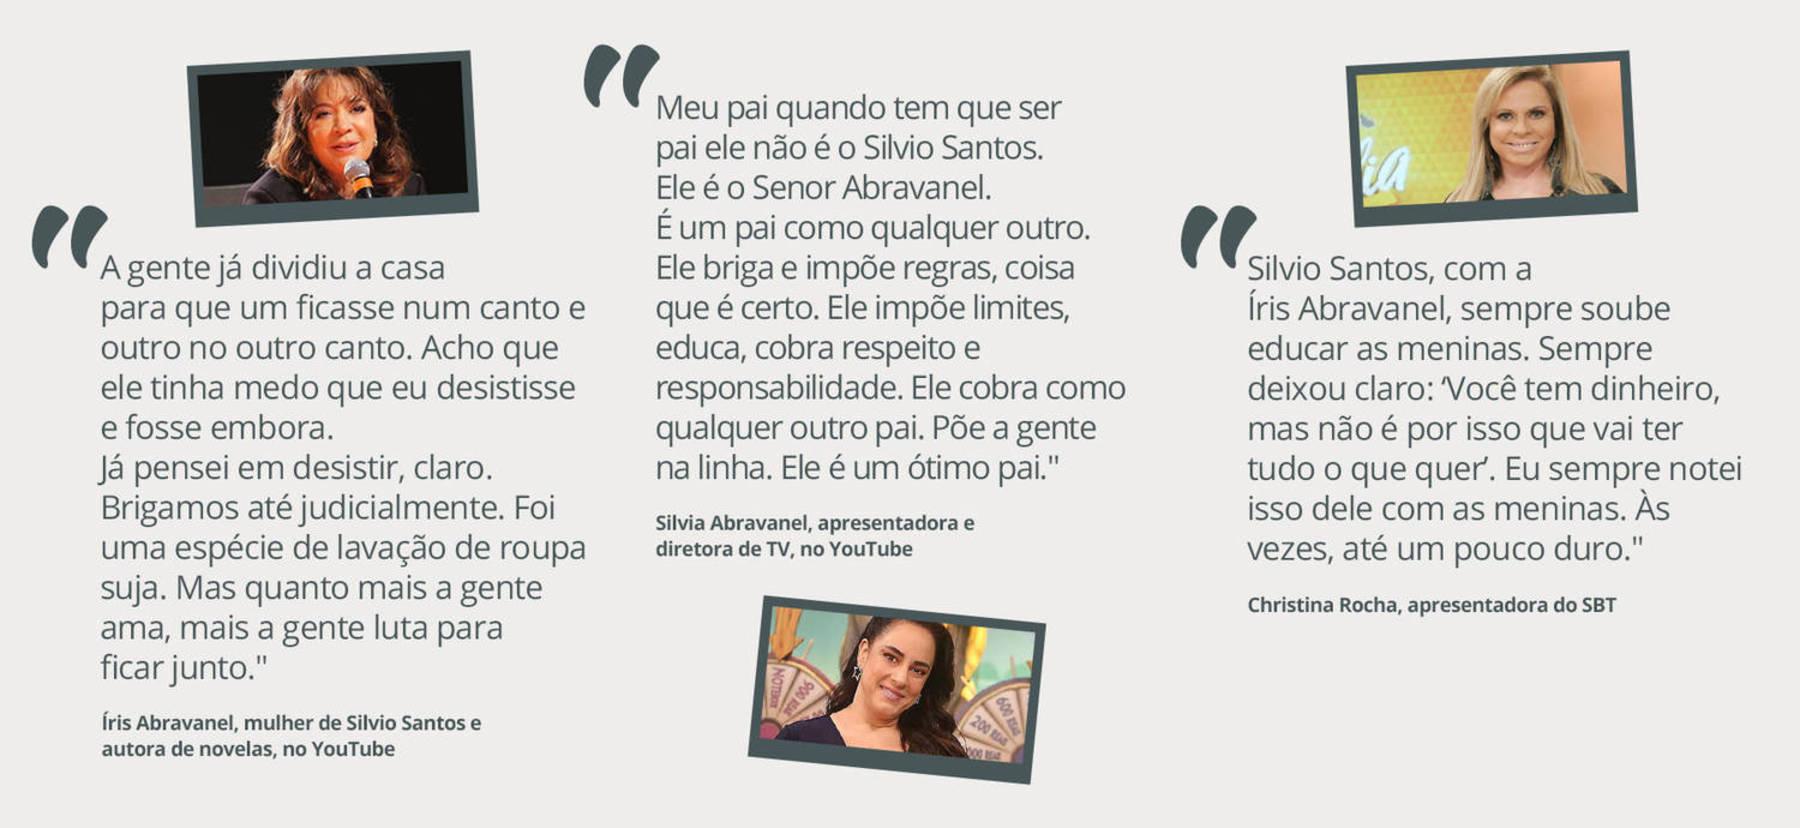 Silvio Santos na intimidade (Arte/R7)